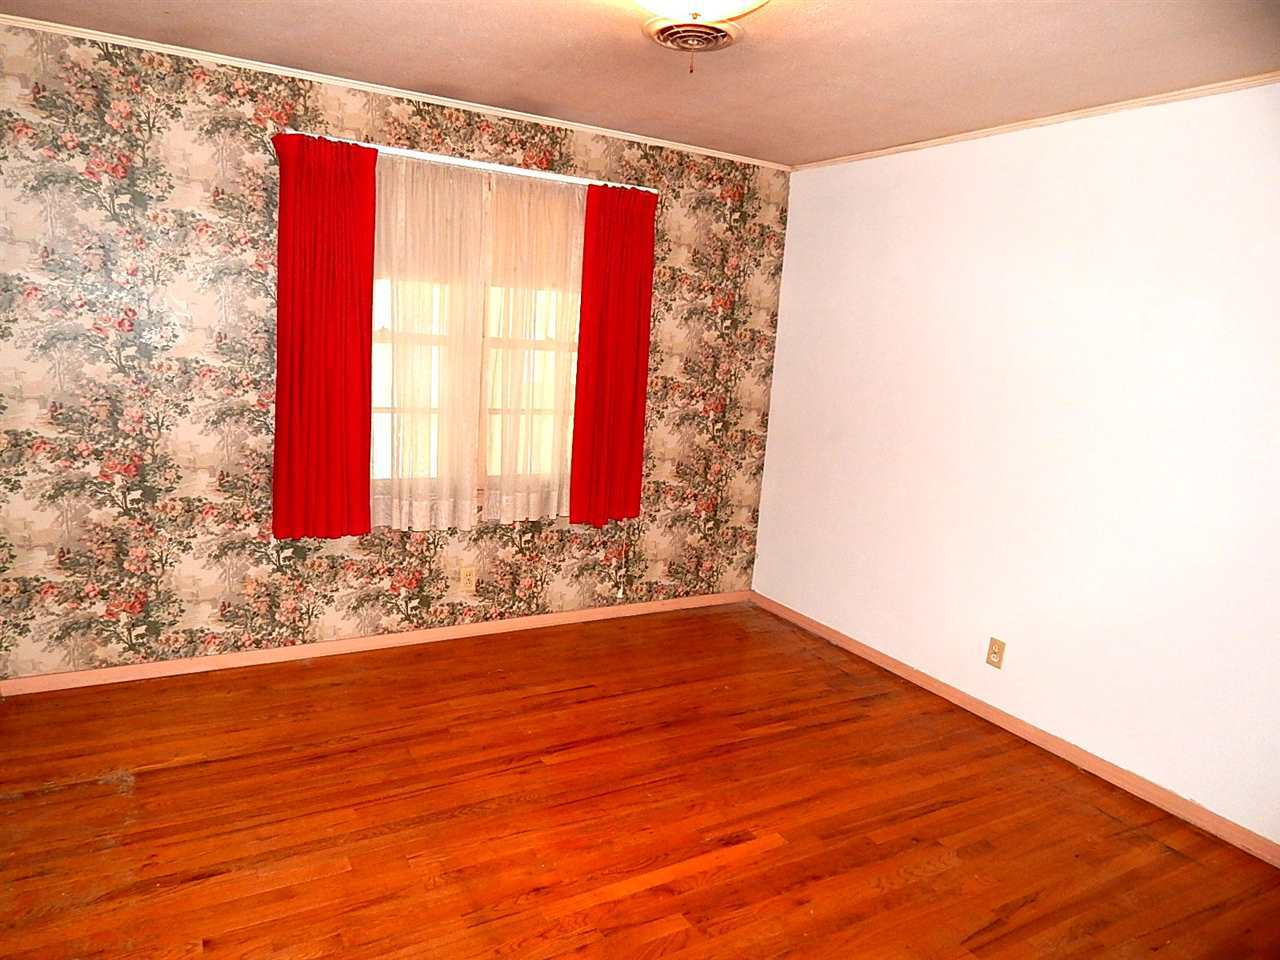 Sold Cross Sale W/ MLS | 720 N 14th Ponca City, OK 74601 10